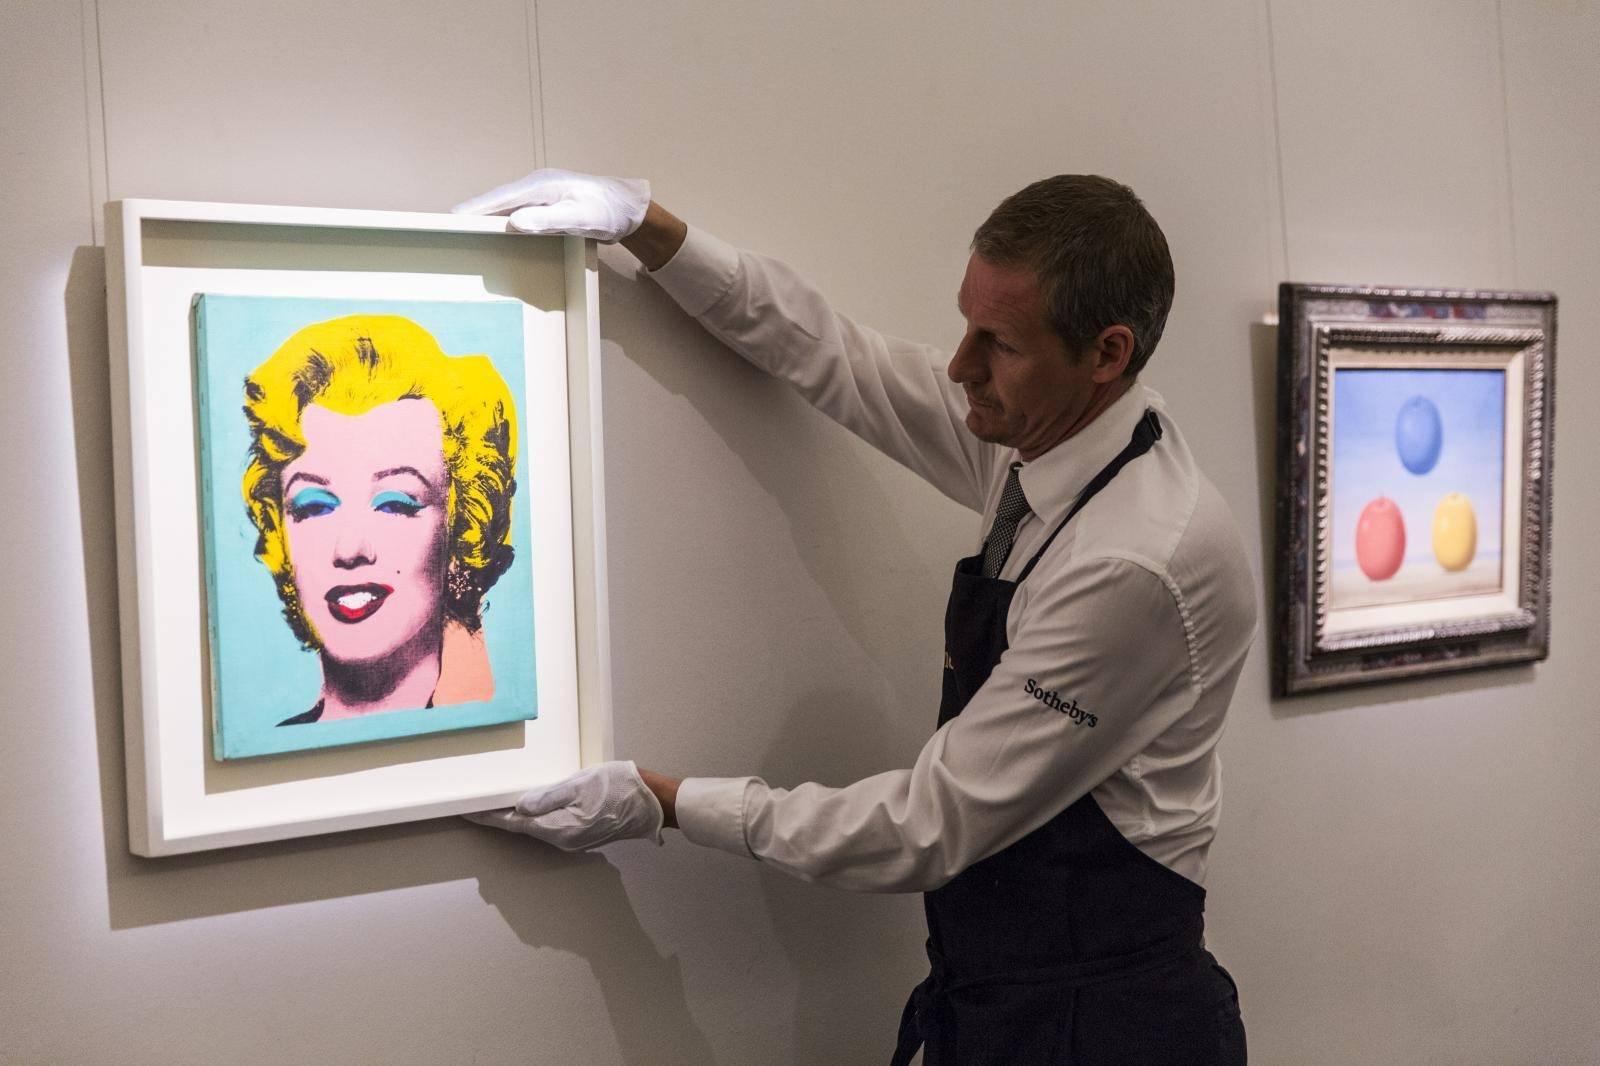 20th Century Art Photocall